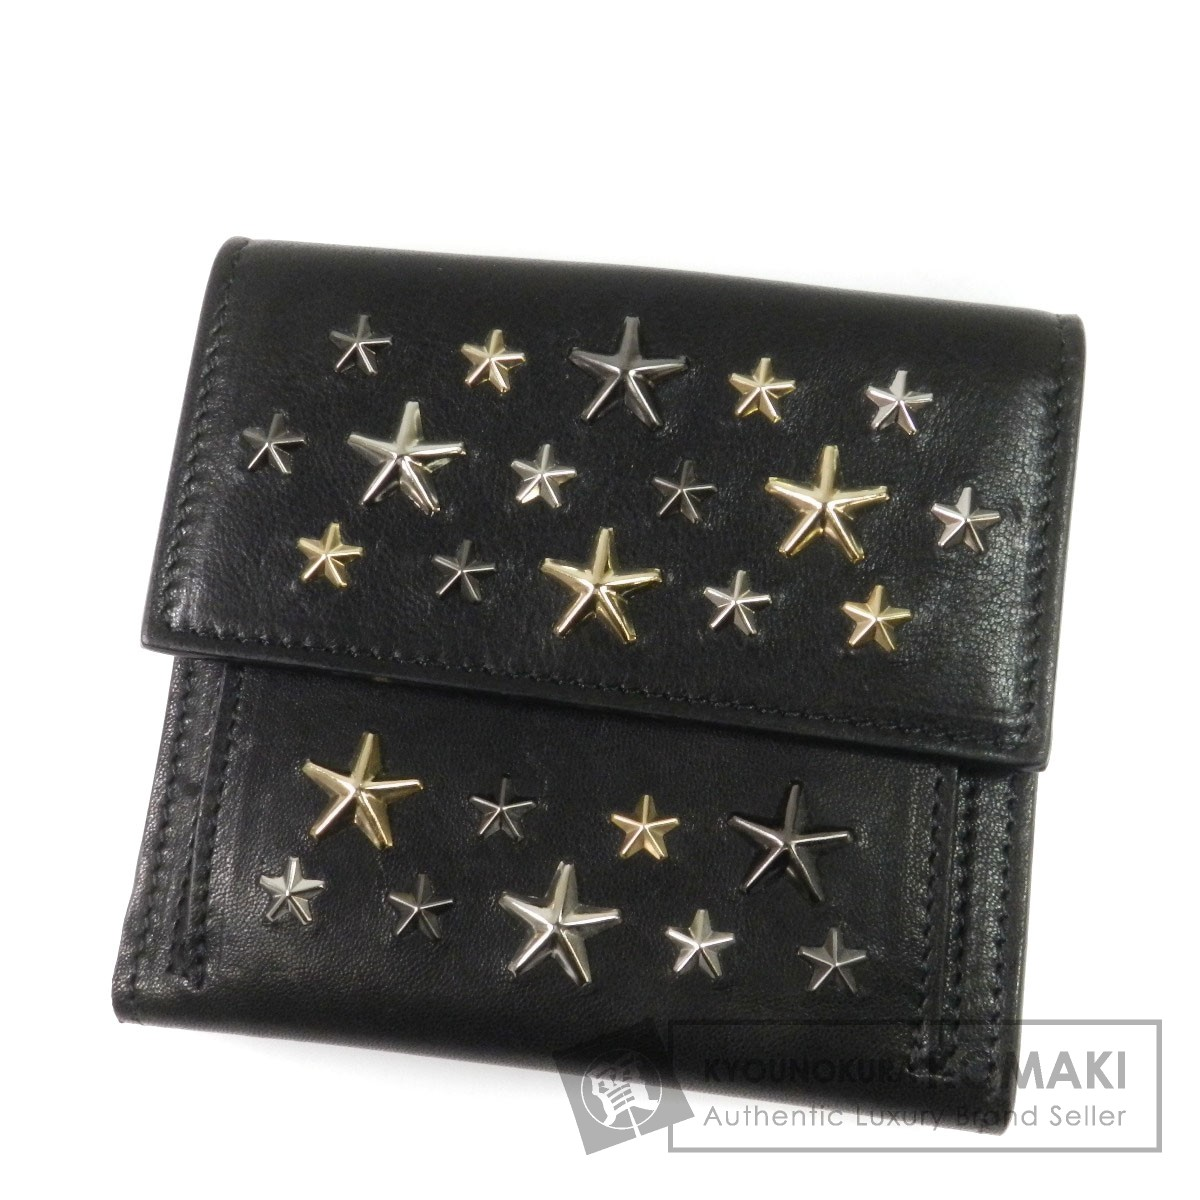 Jimmy Choo 星 二つ折り財布(小銭入れあり) レザー レディース 【中古】【ジミーチュウ】